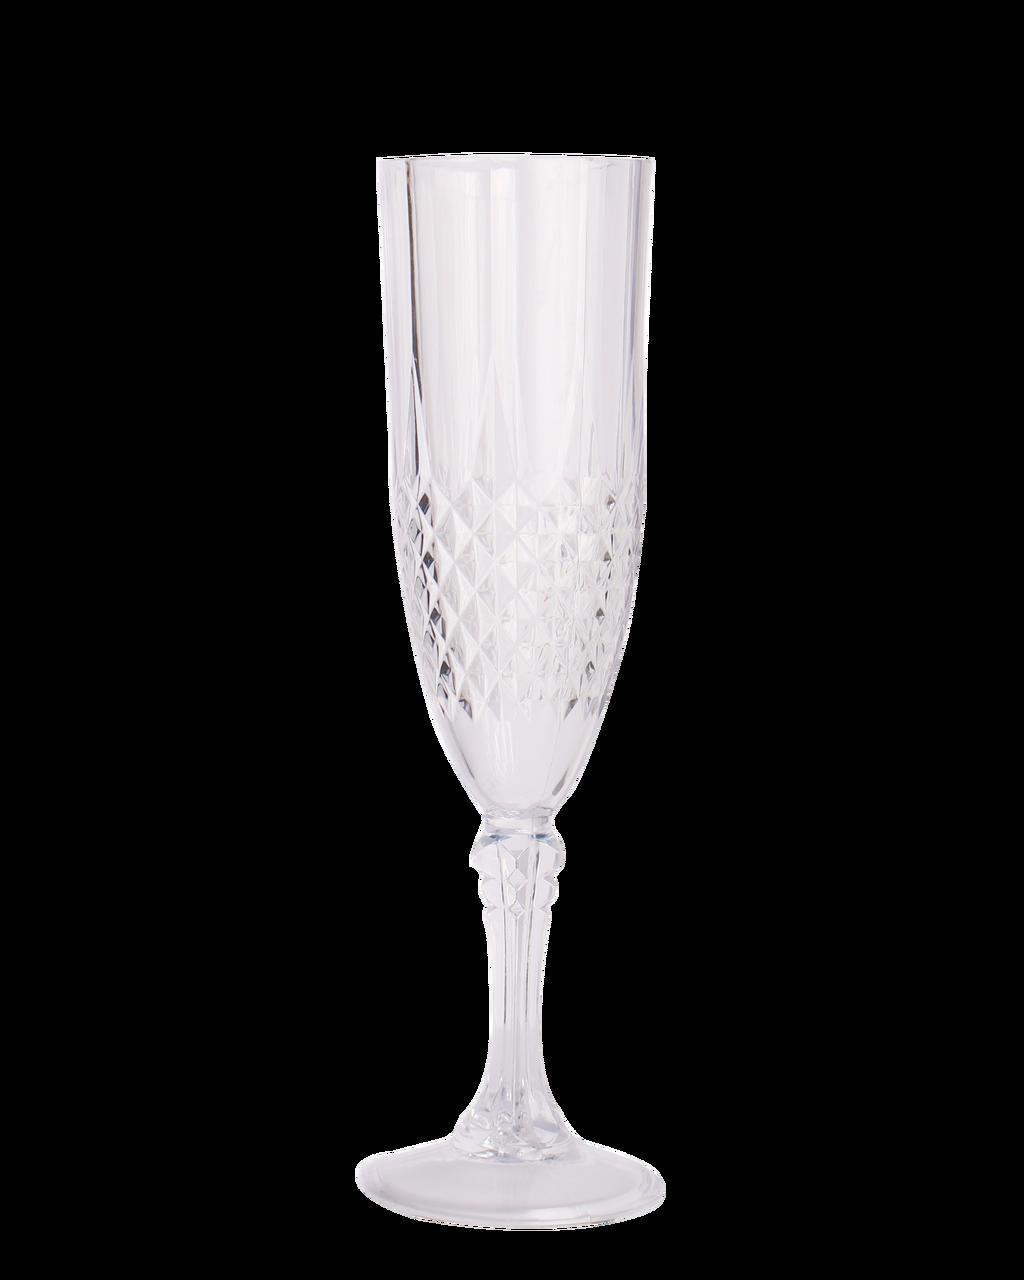 8 oz Crystal Plastic Champagne Flutes 4 Glasses